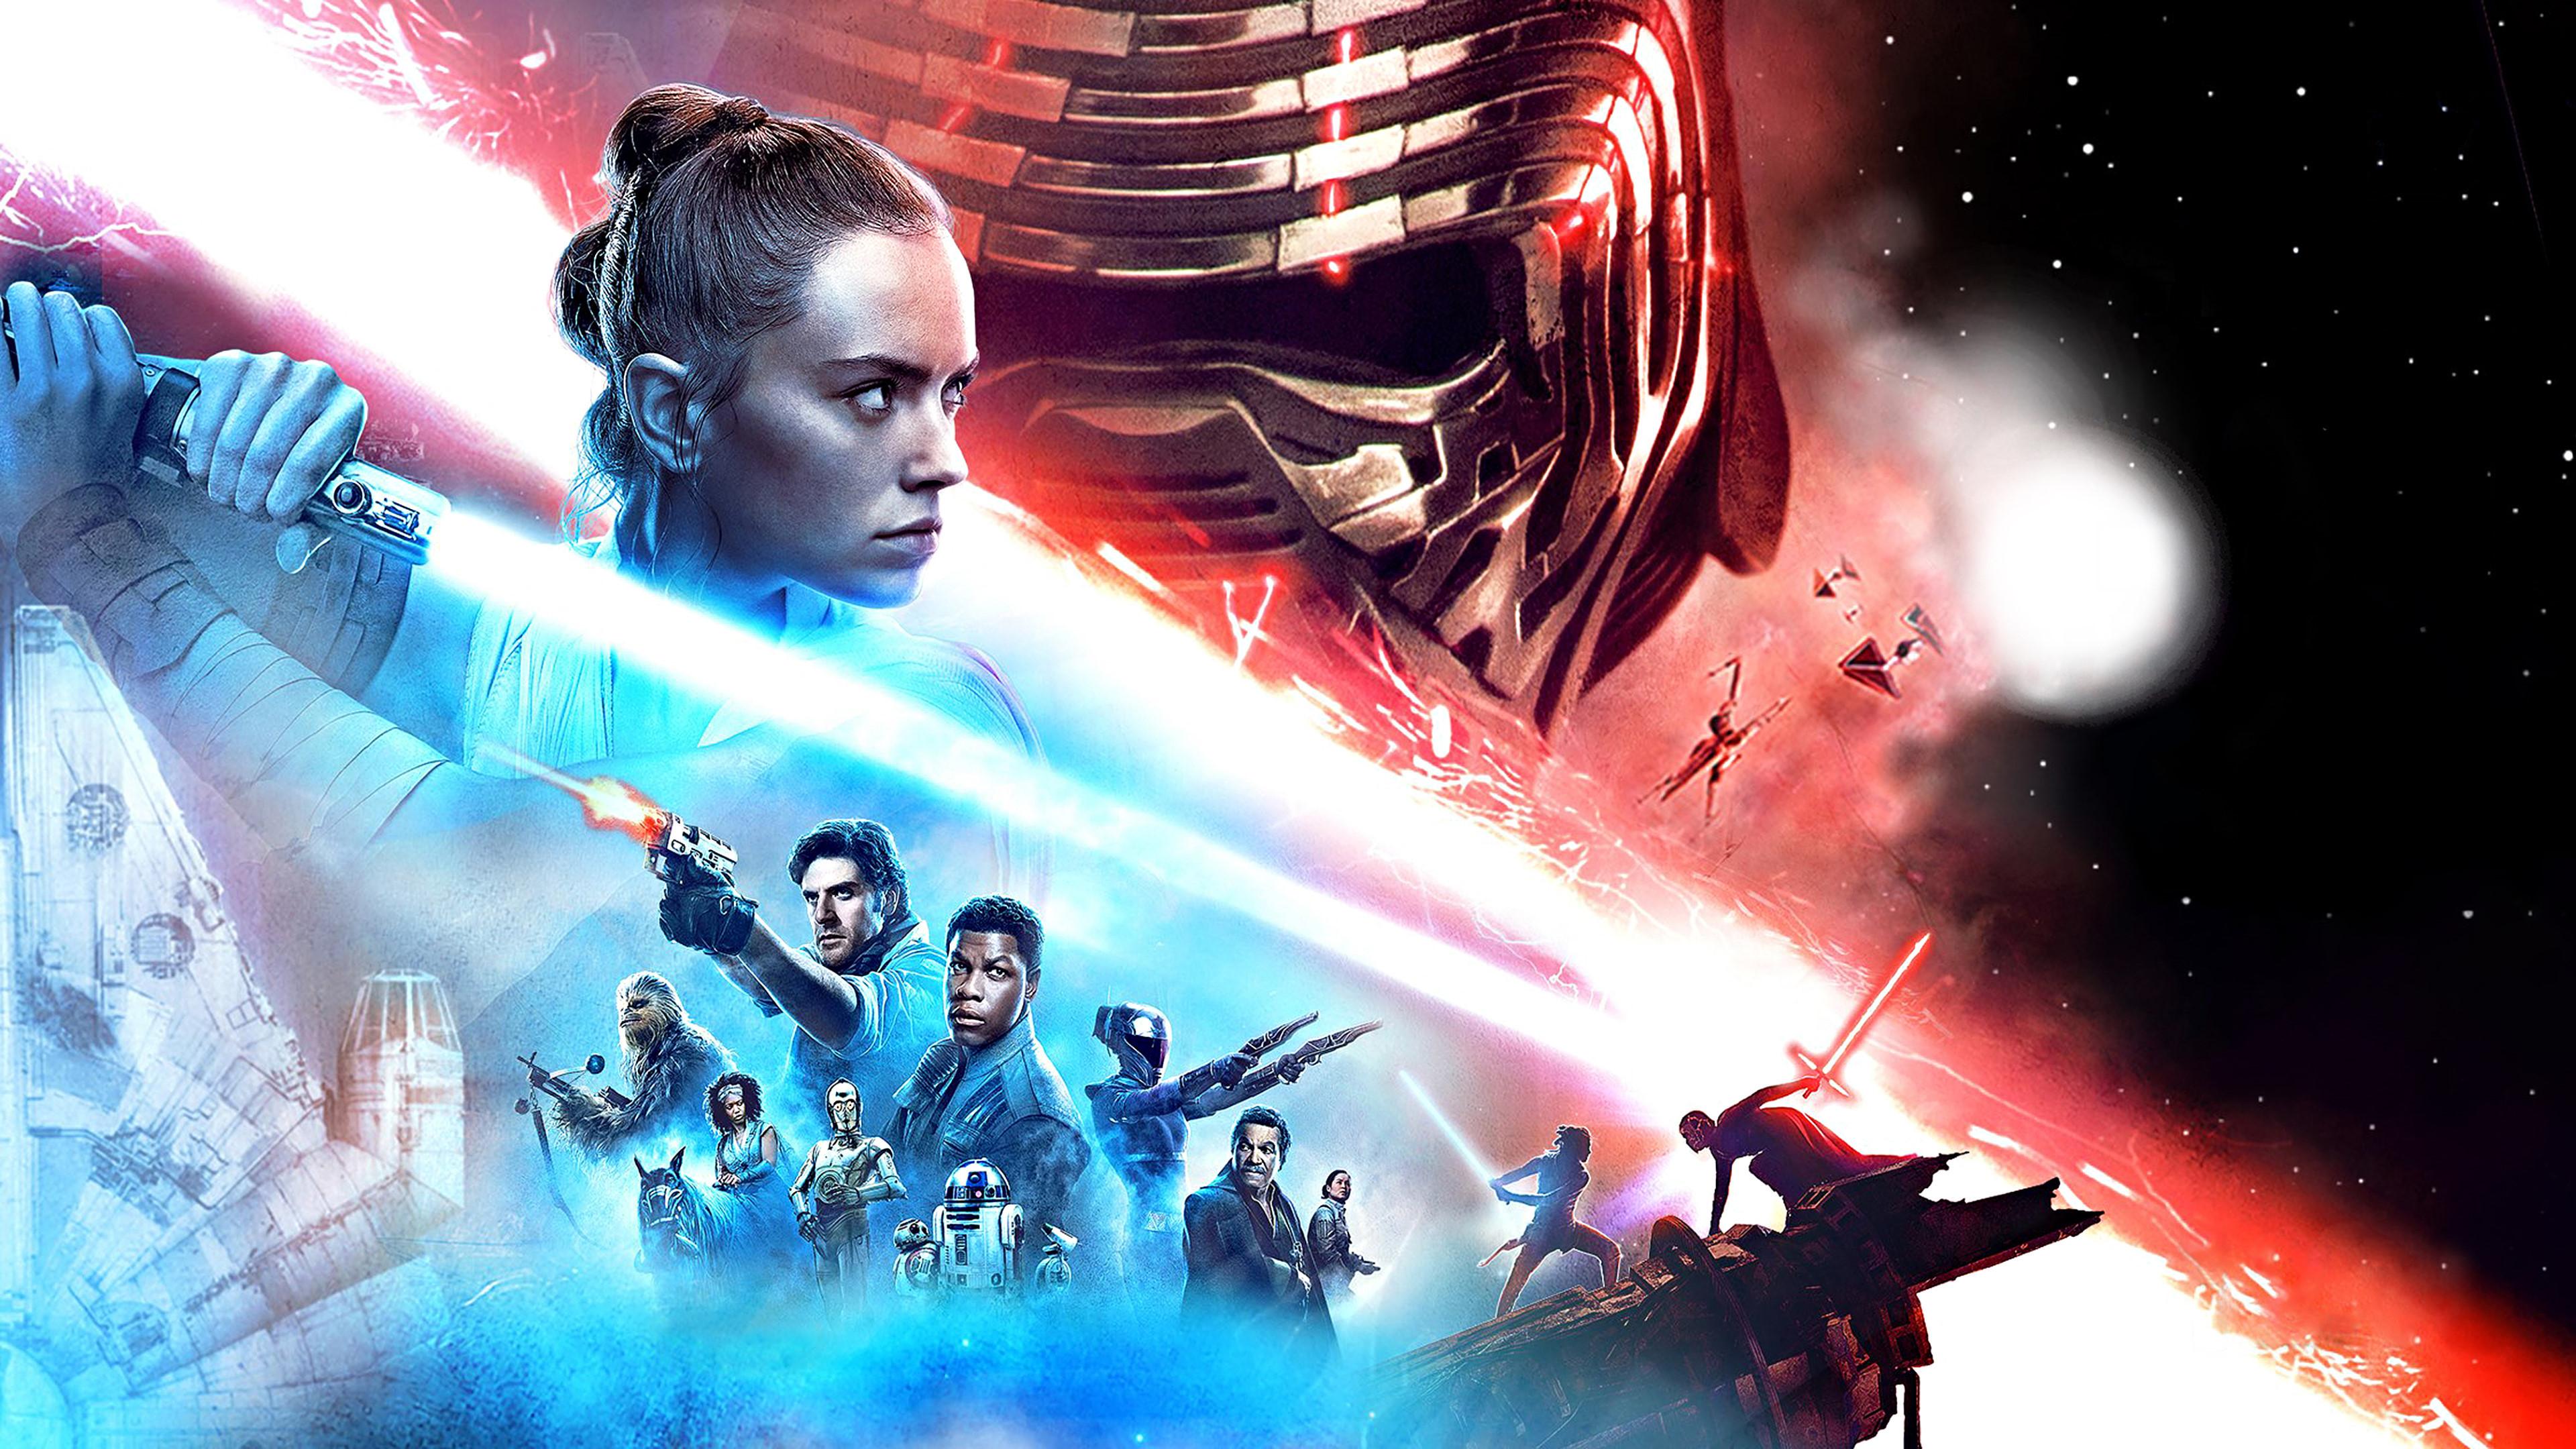 Download Wallpaper Episode Ix Star Wars The Rise Of Skywalker